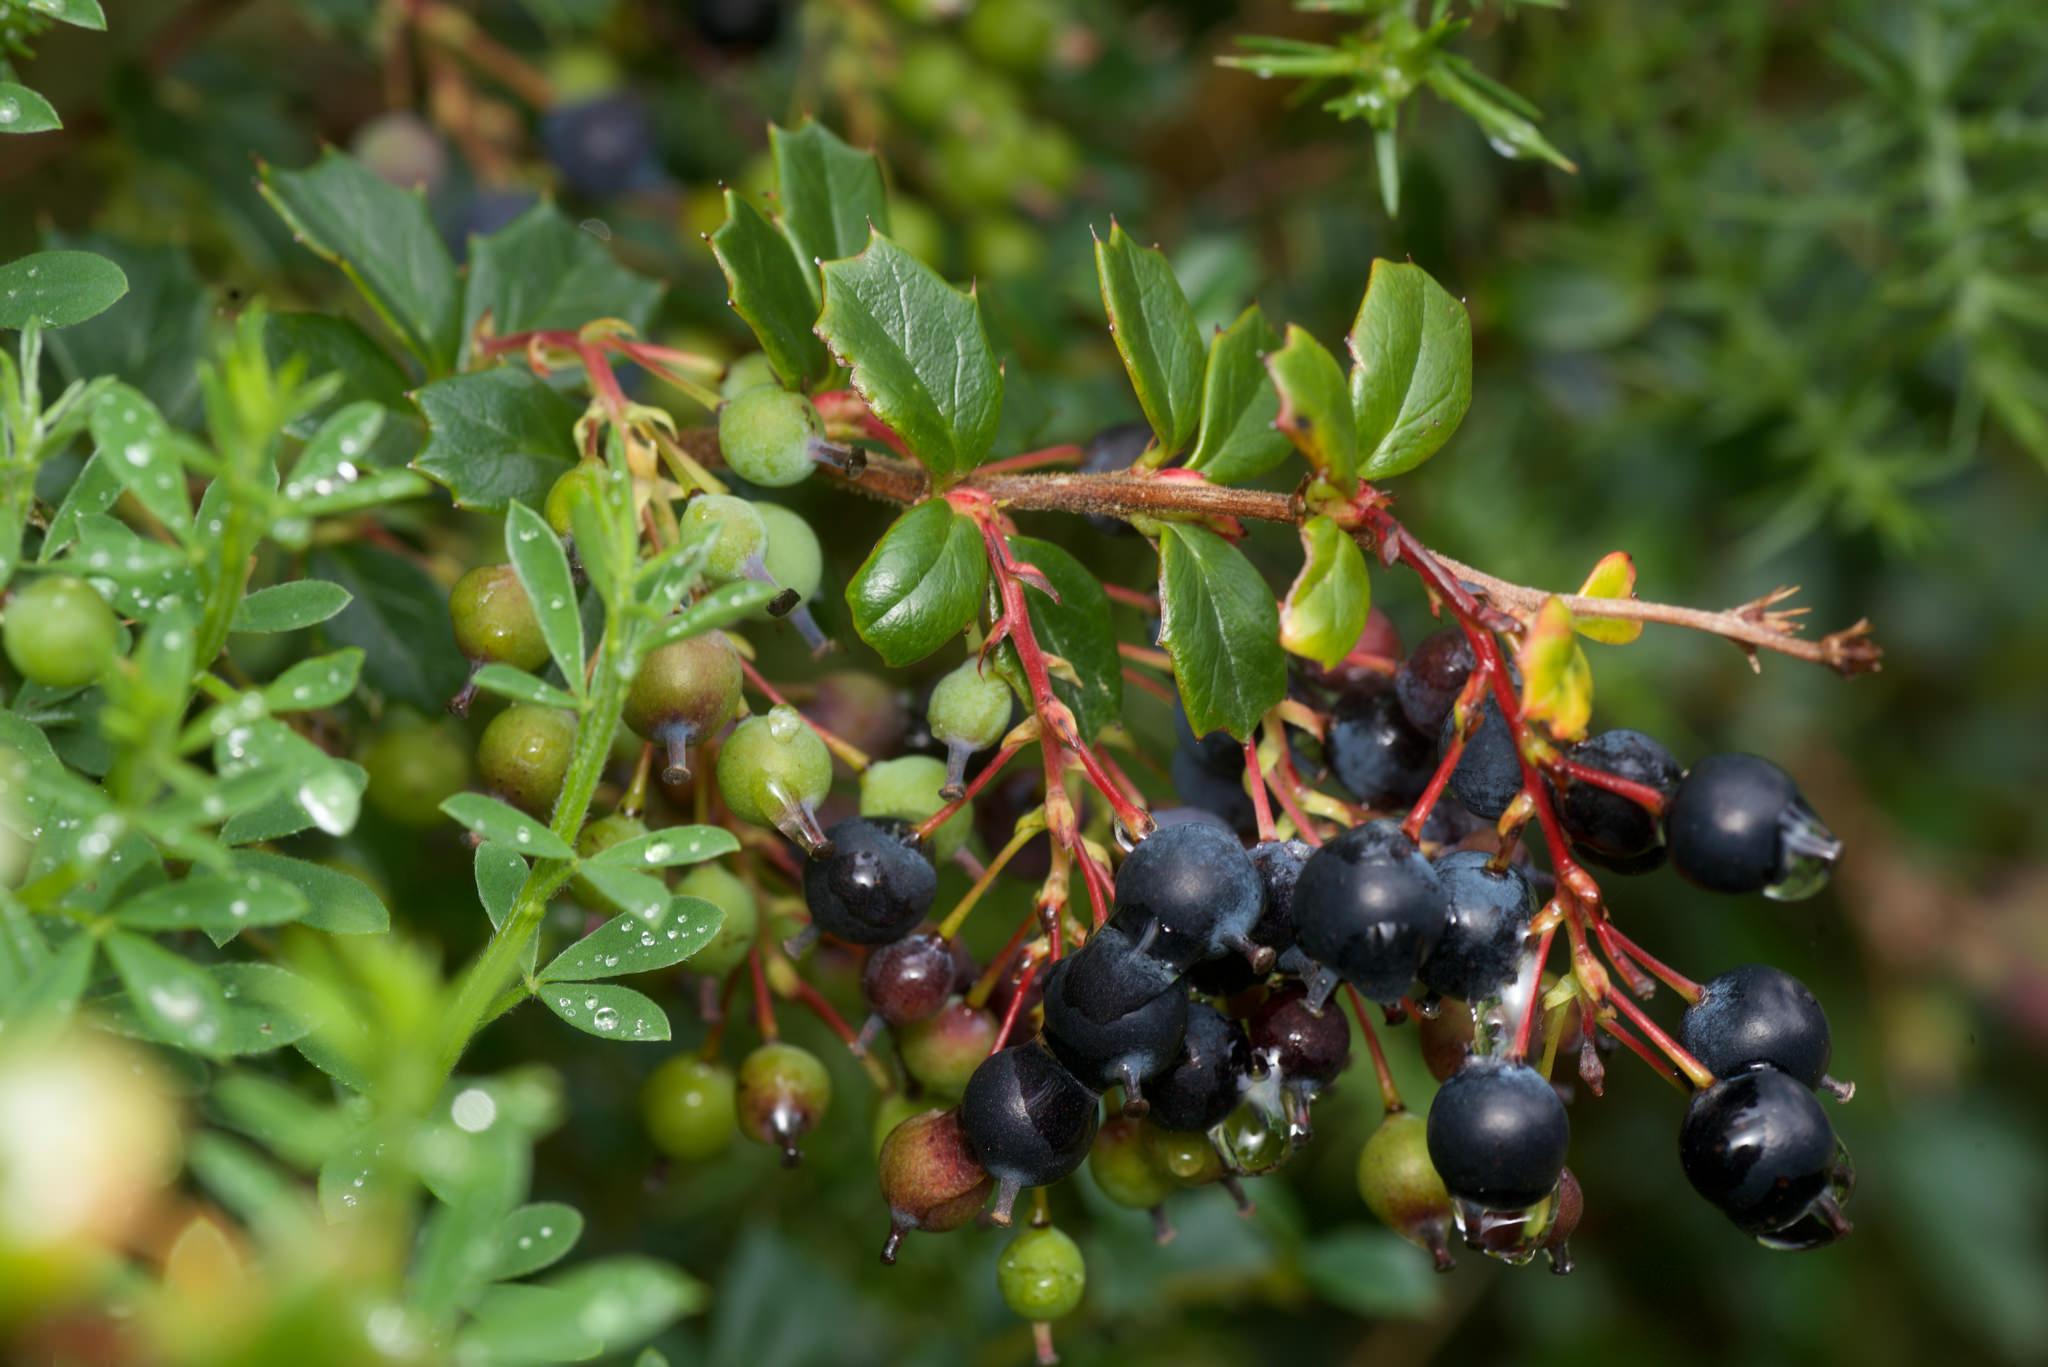 Darwin's barberry (Berberis darwinii) fruit